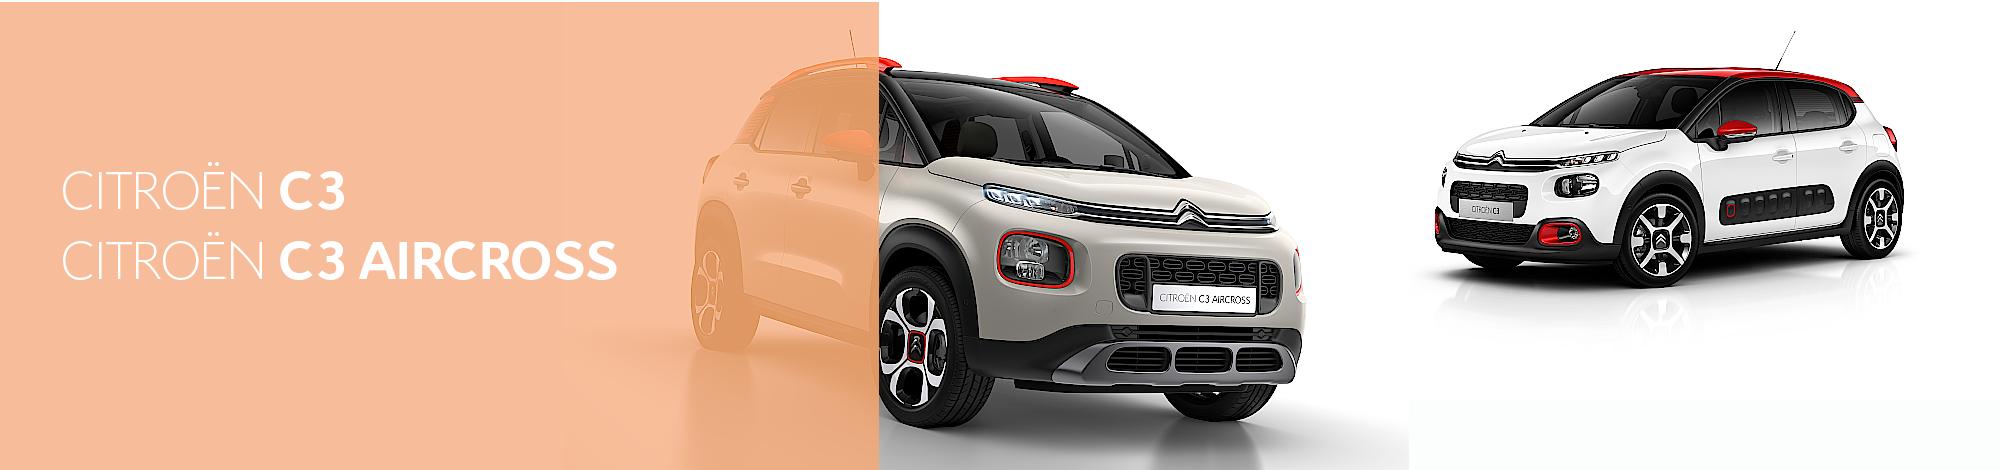 Citroën C3 Actie